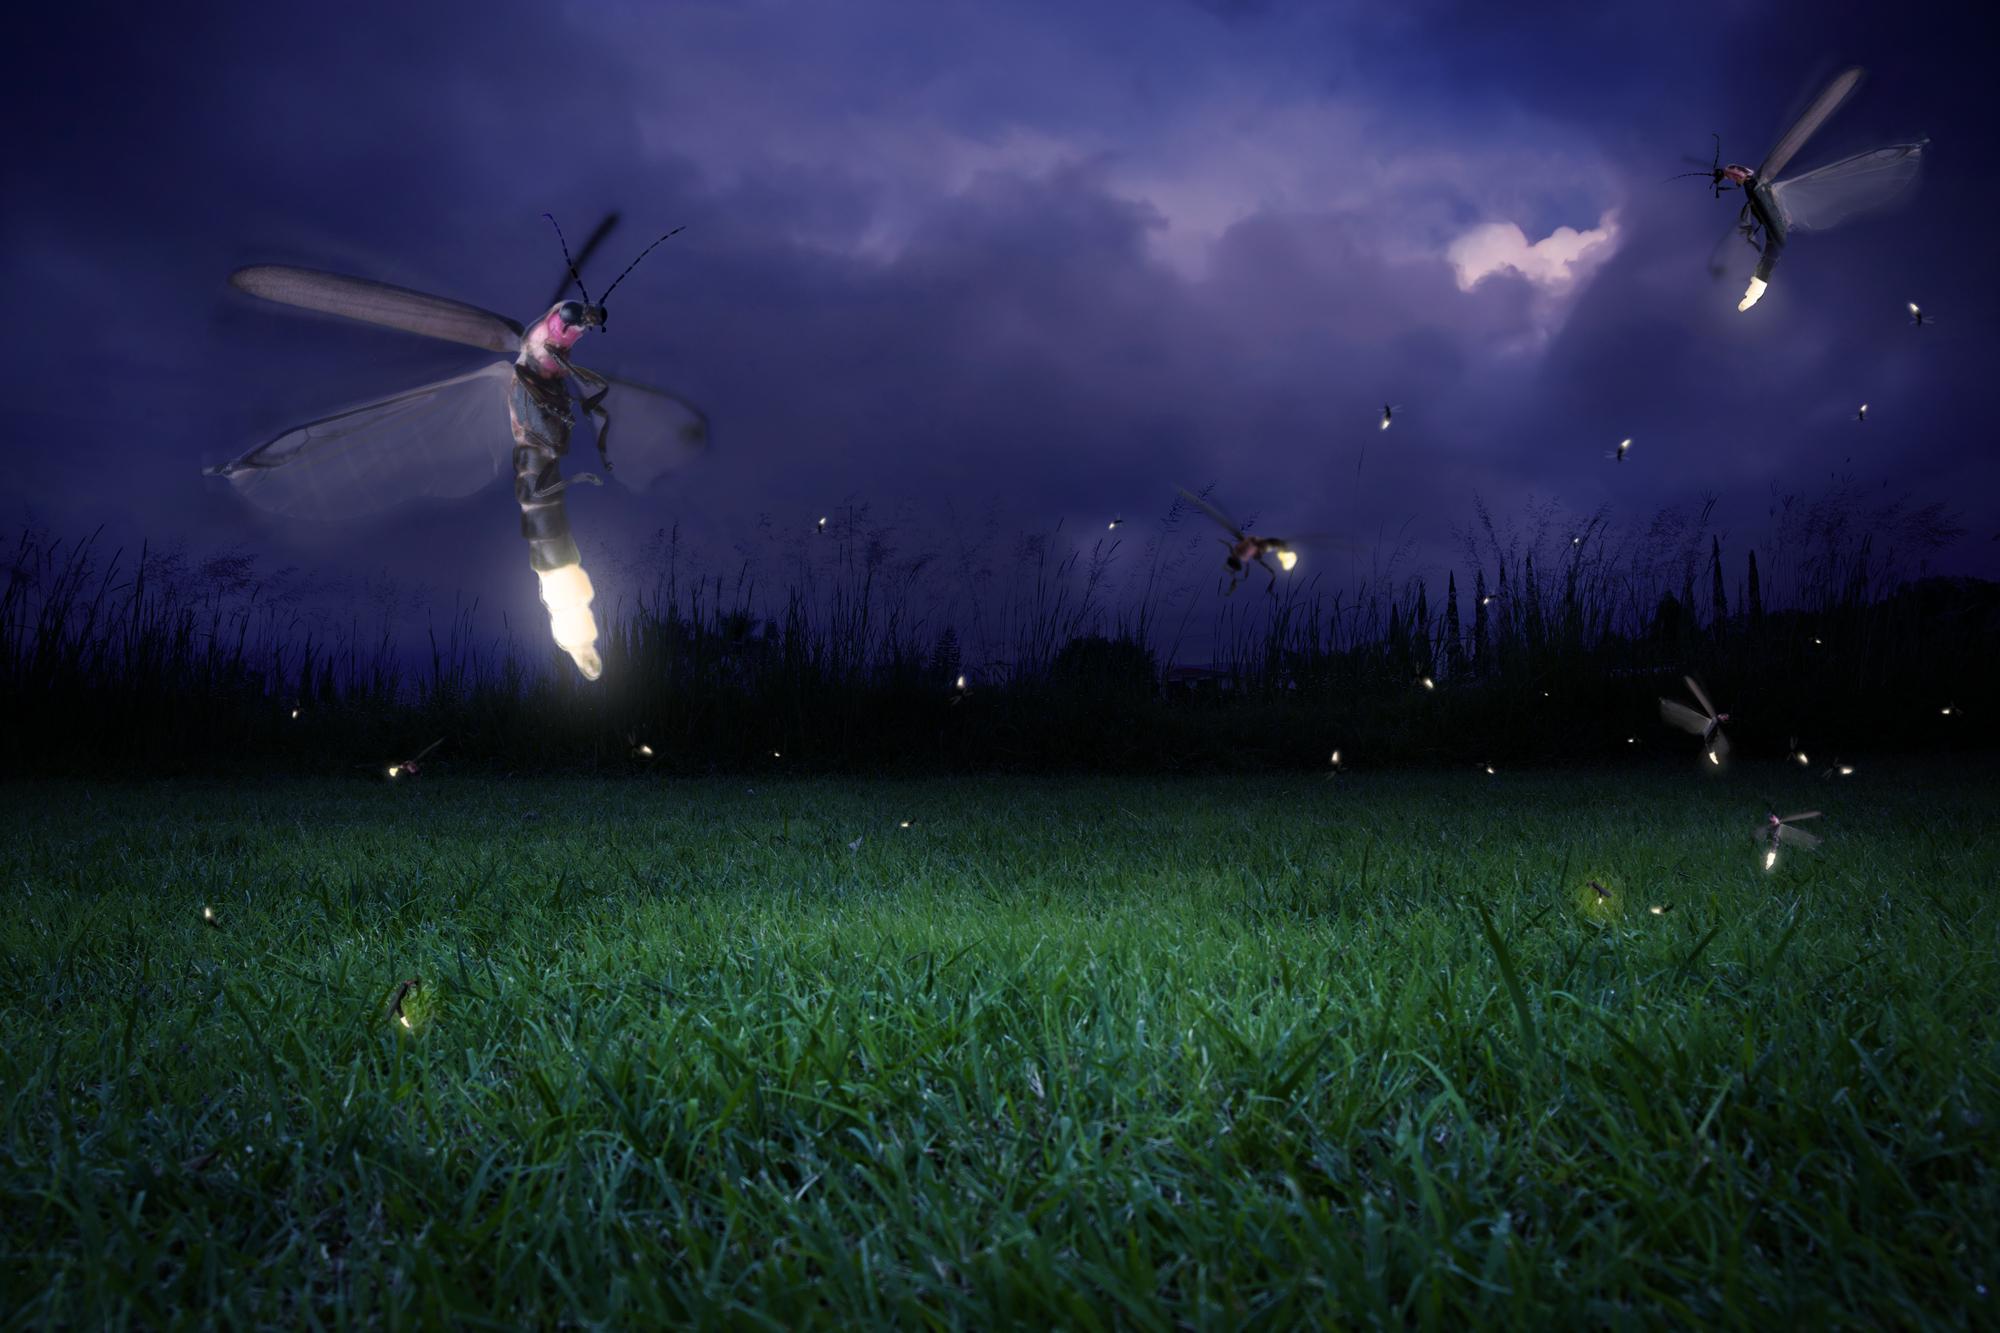 Fireflies may use a